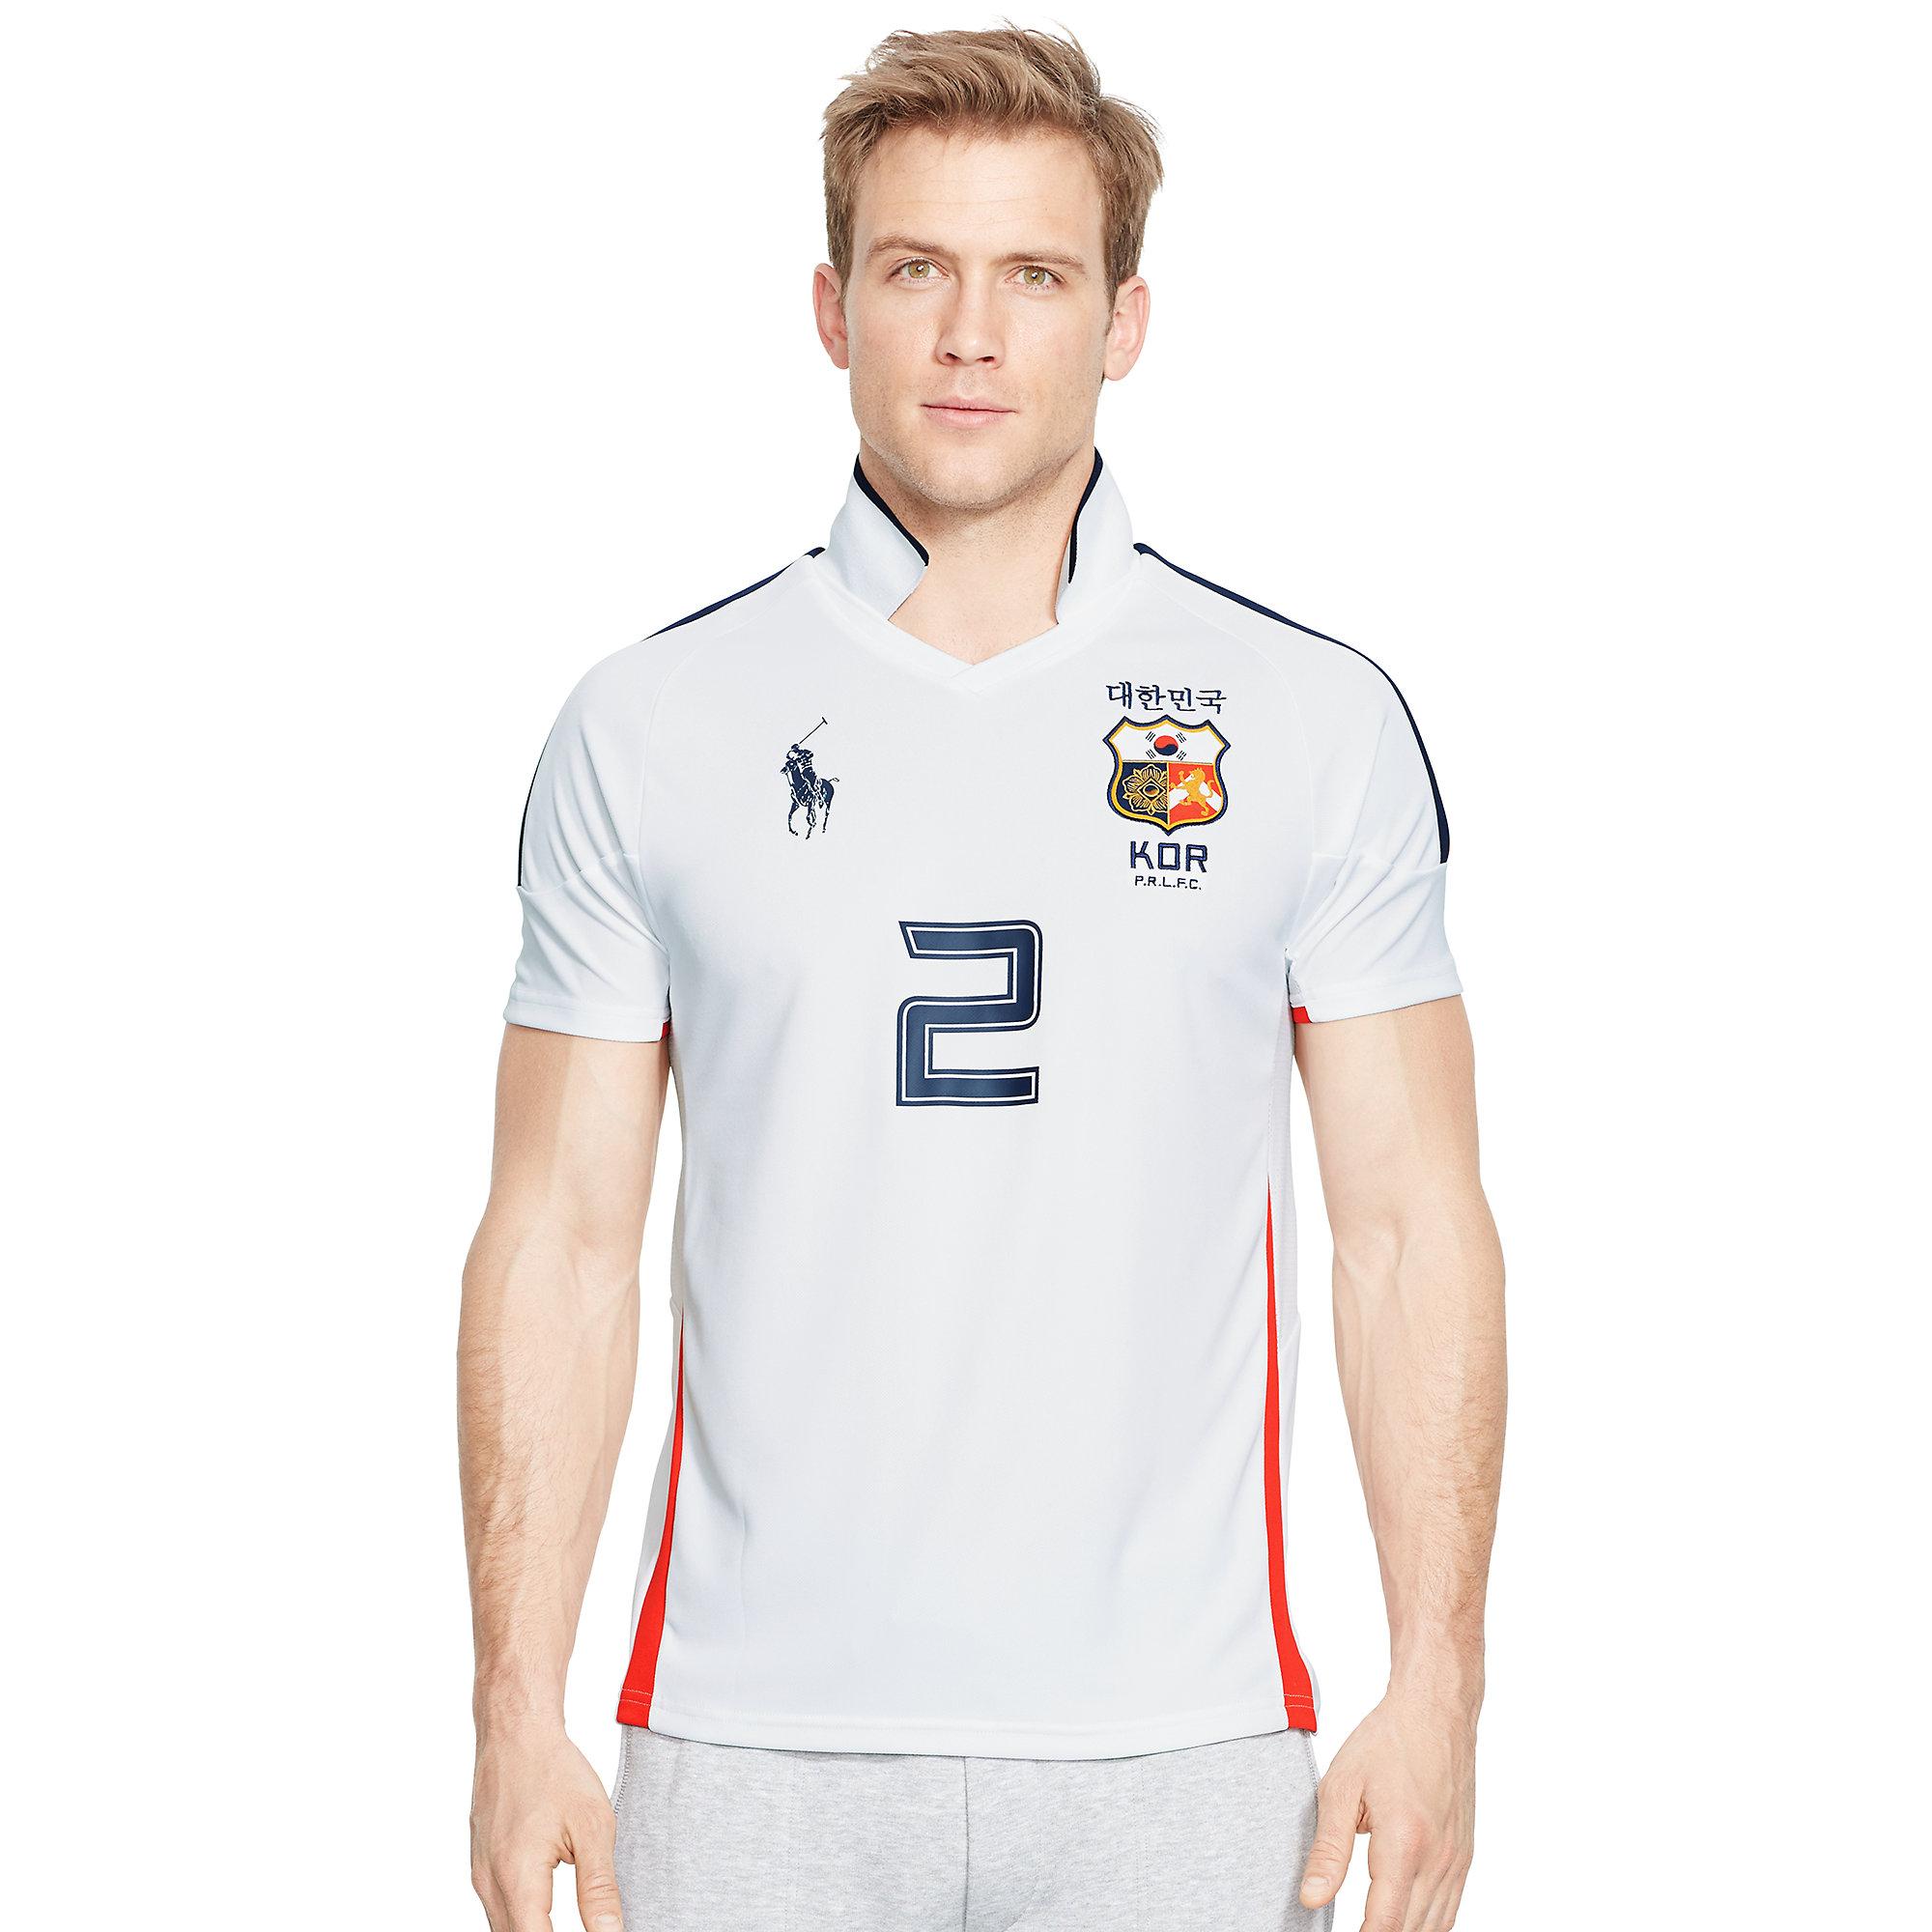 Ralph Lauren Olkalaukku : Ralph lauren korea jersey polo shirt in white for men lyst